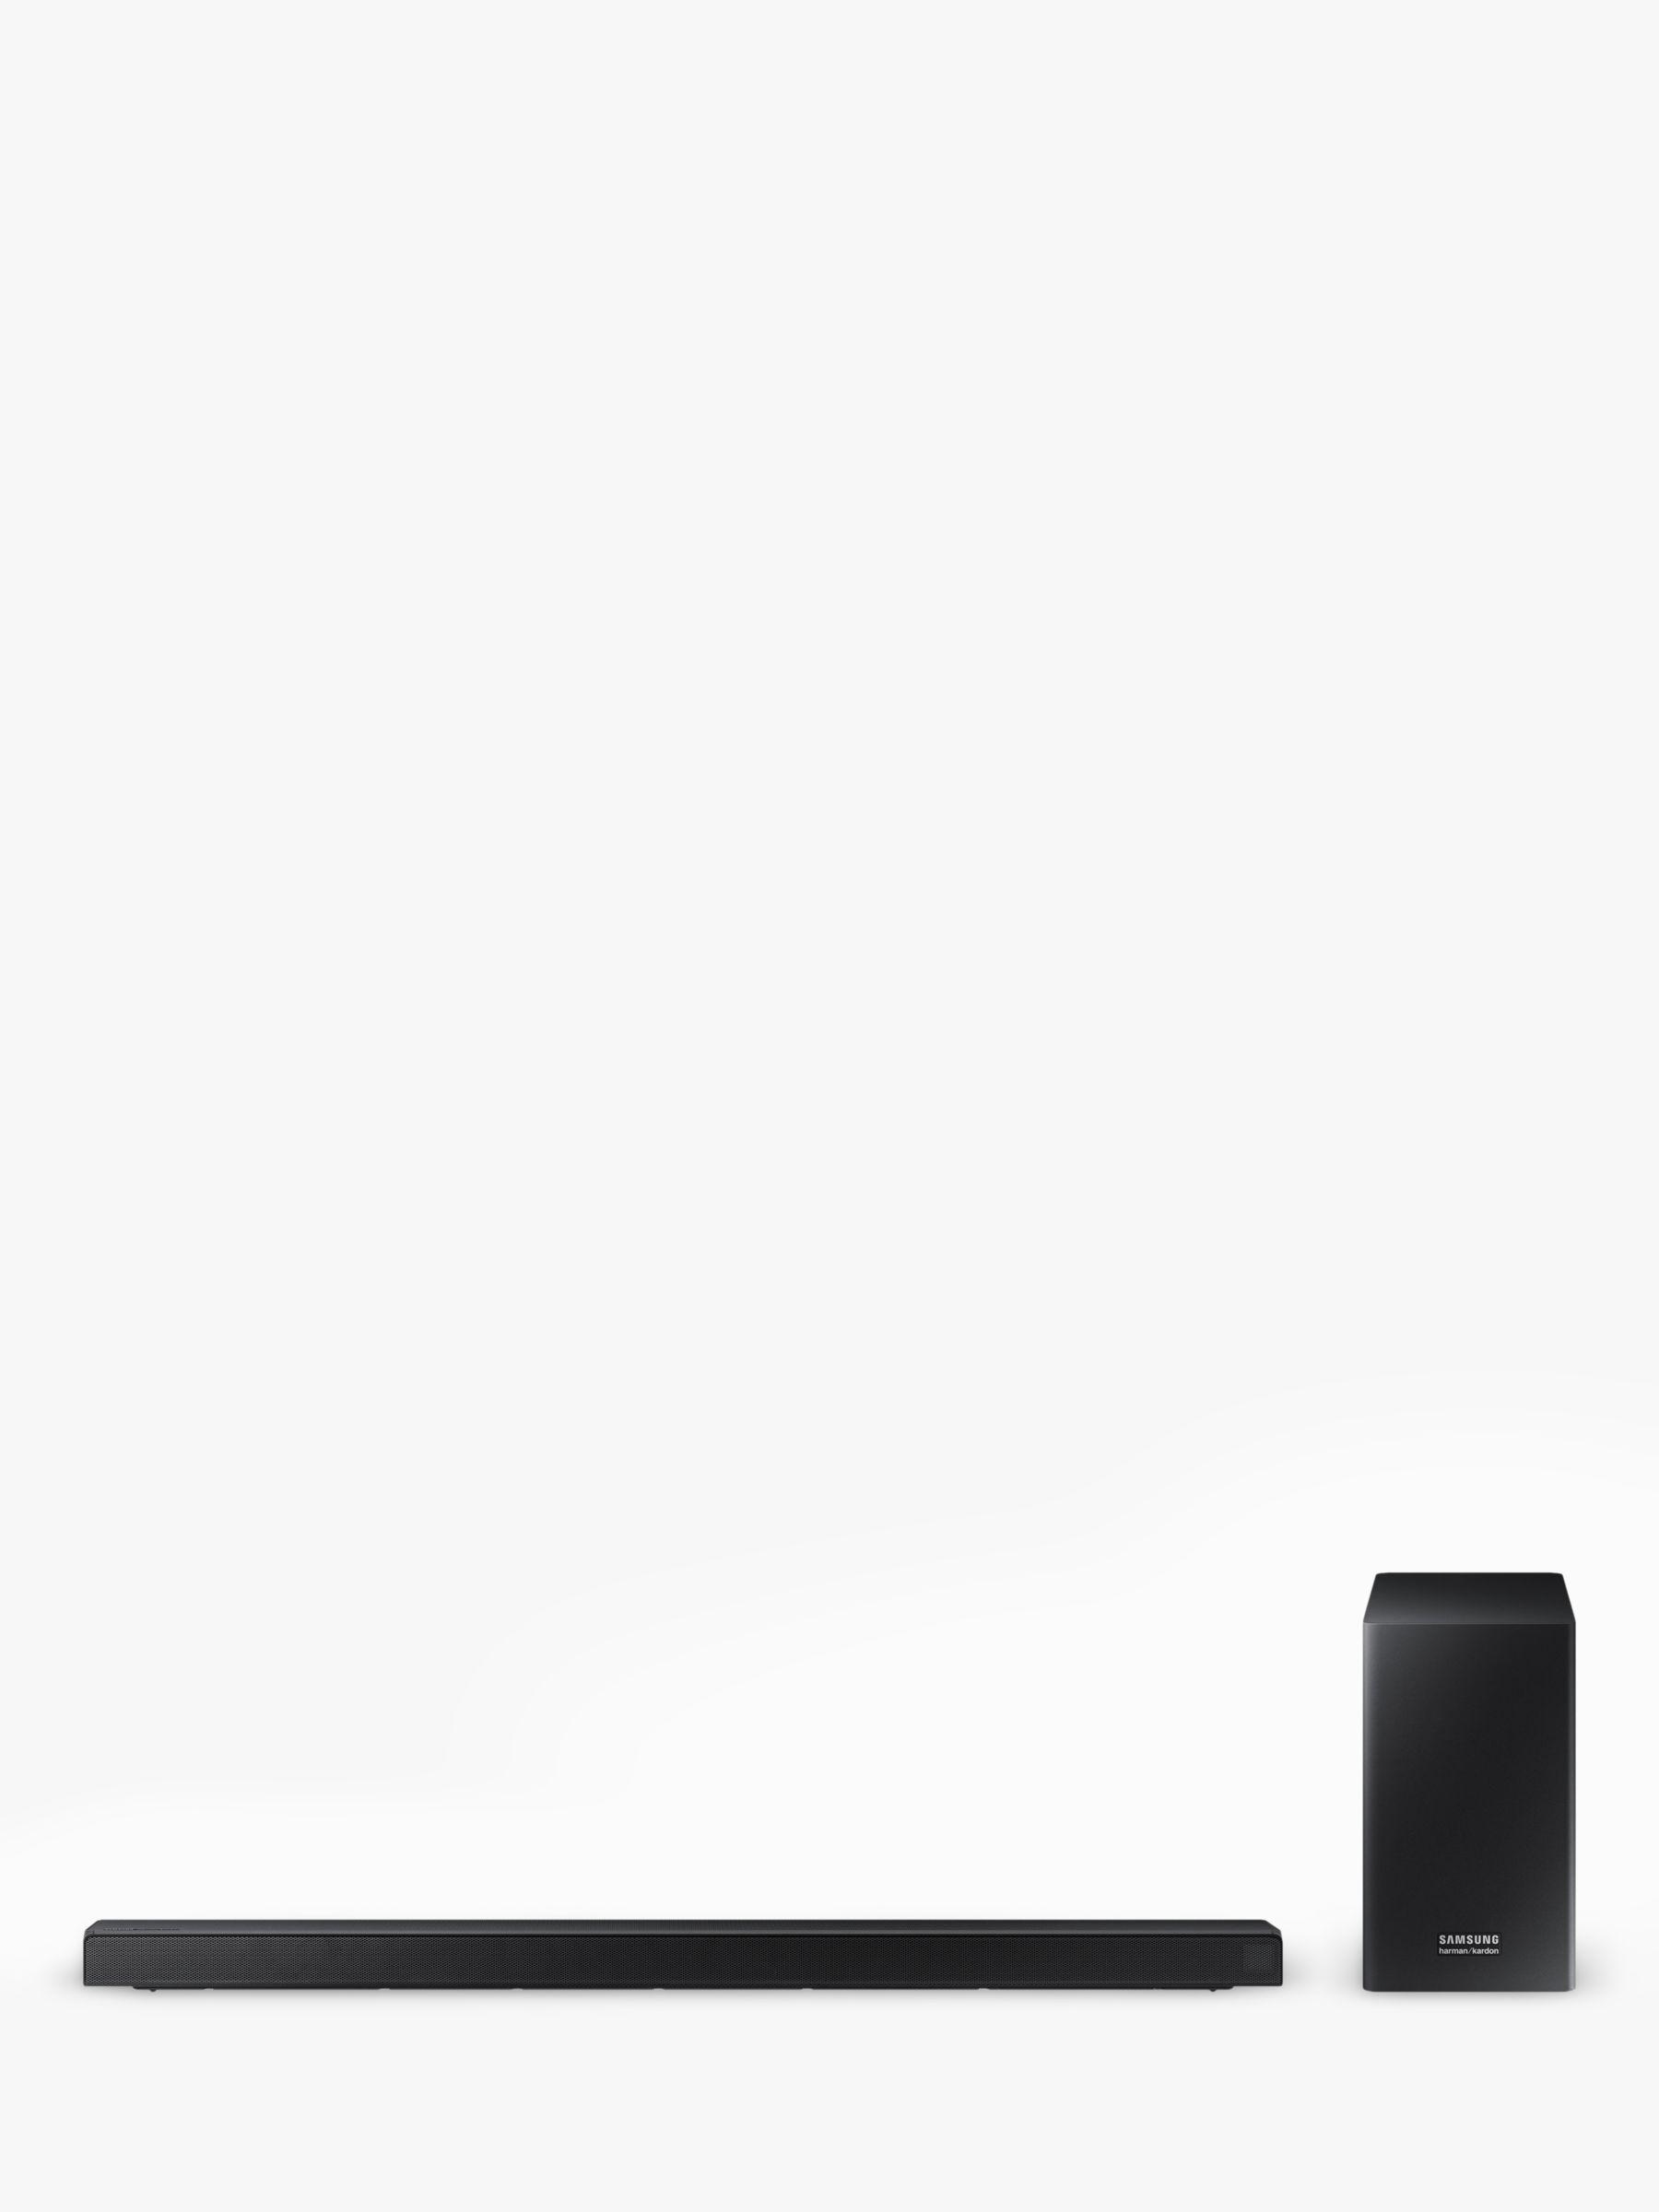 Samsung Samsung harman/kardon HW-Q60R Bluetooth Cinematic Sound Bar with Wireless Subwoofer